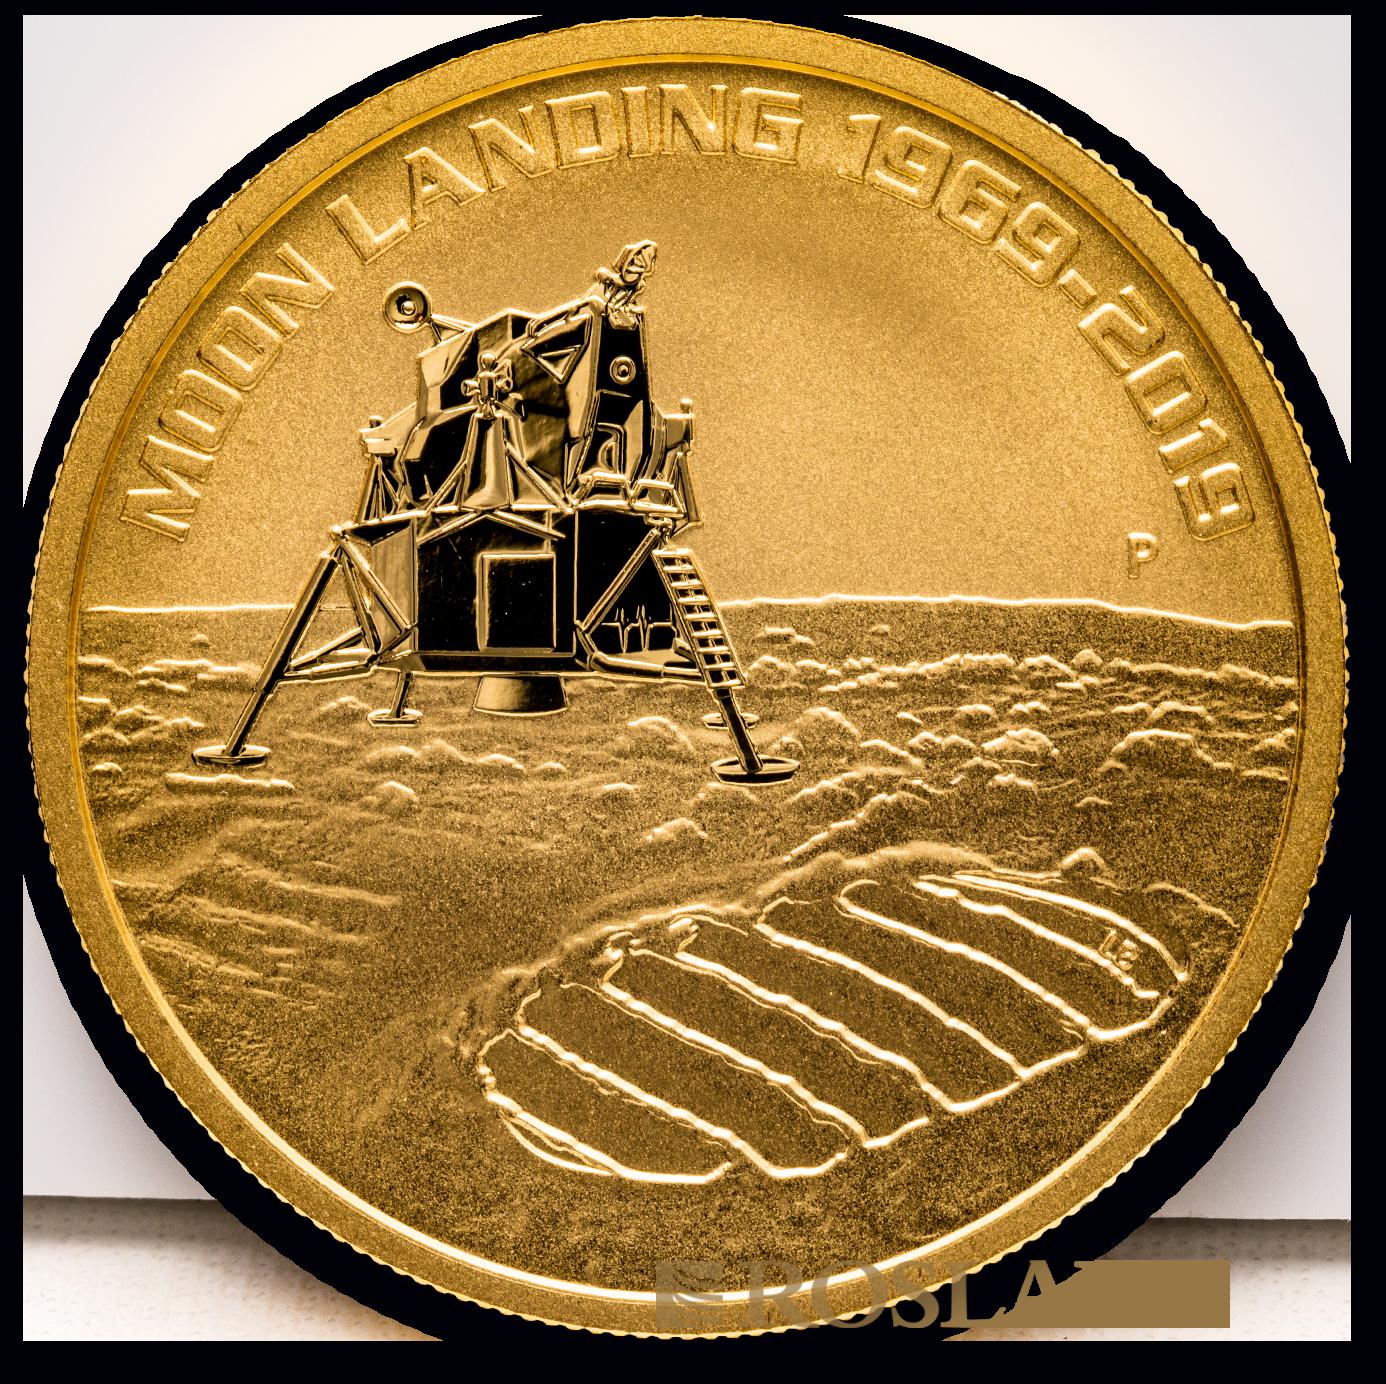 1 Unze Goldmünze Landung zum Mond 50 Jahre Jubiläum 2019